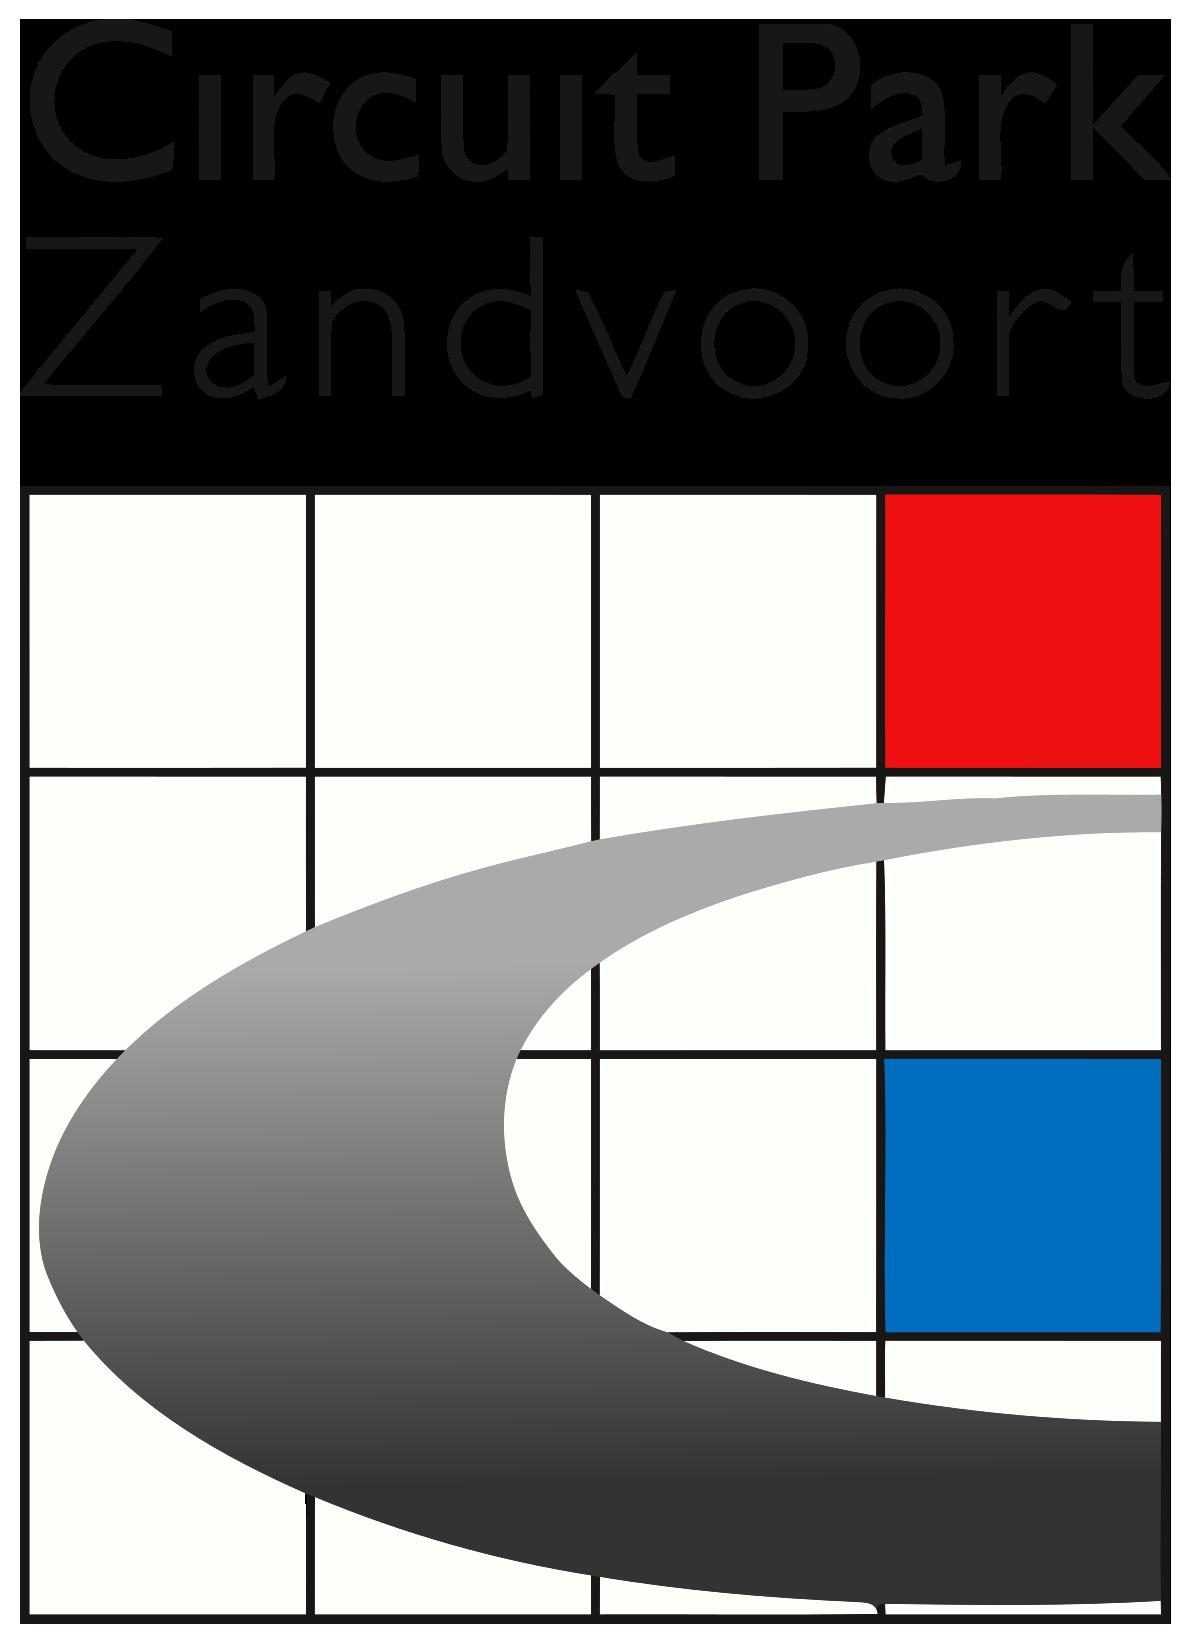 Garetta stasera random GT6-zandvoort-png